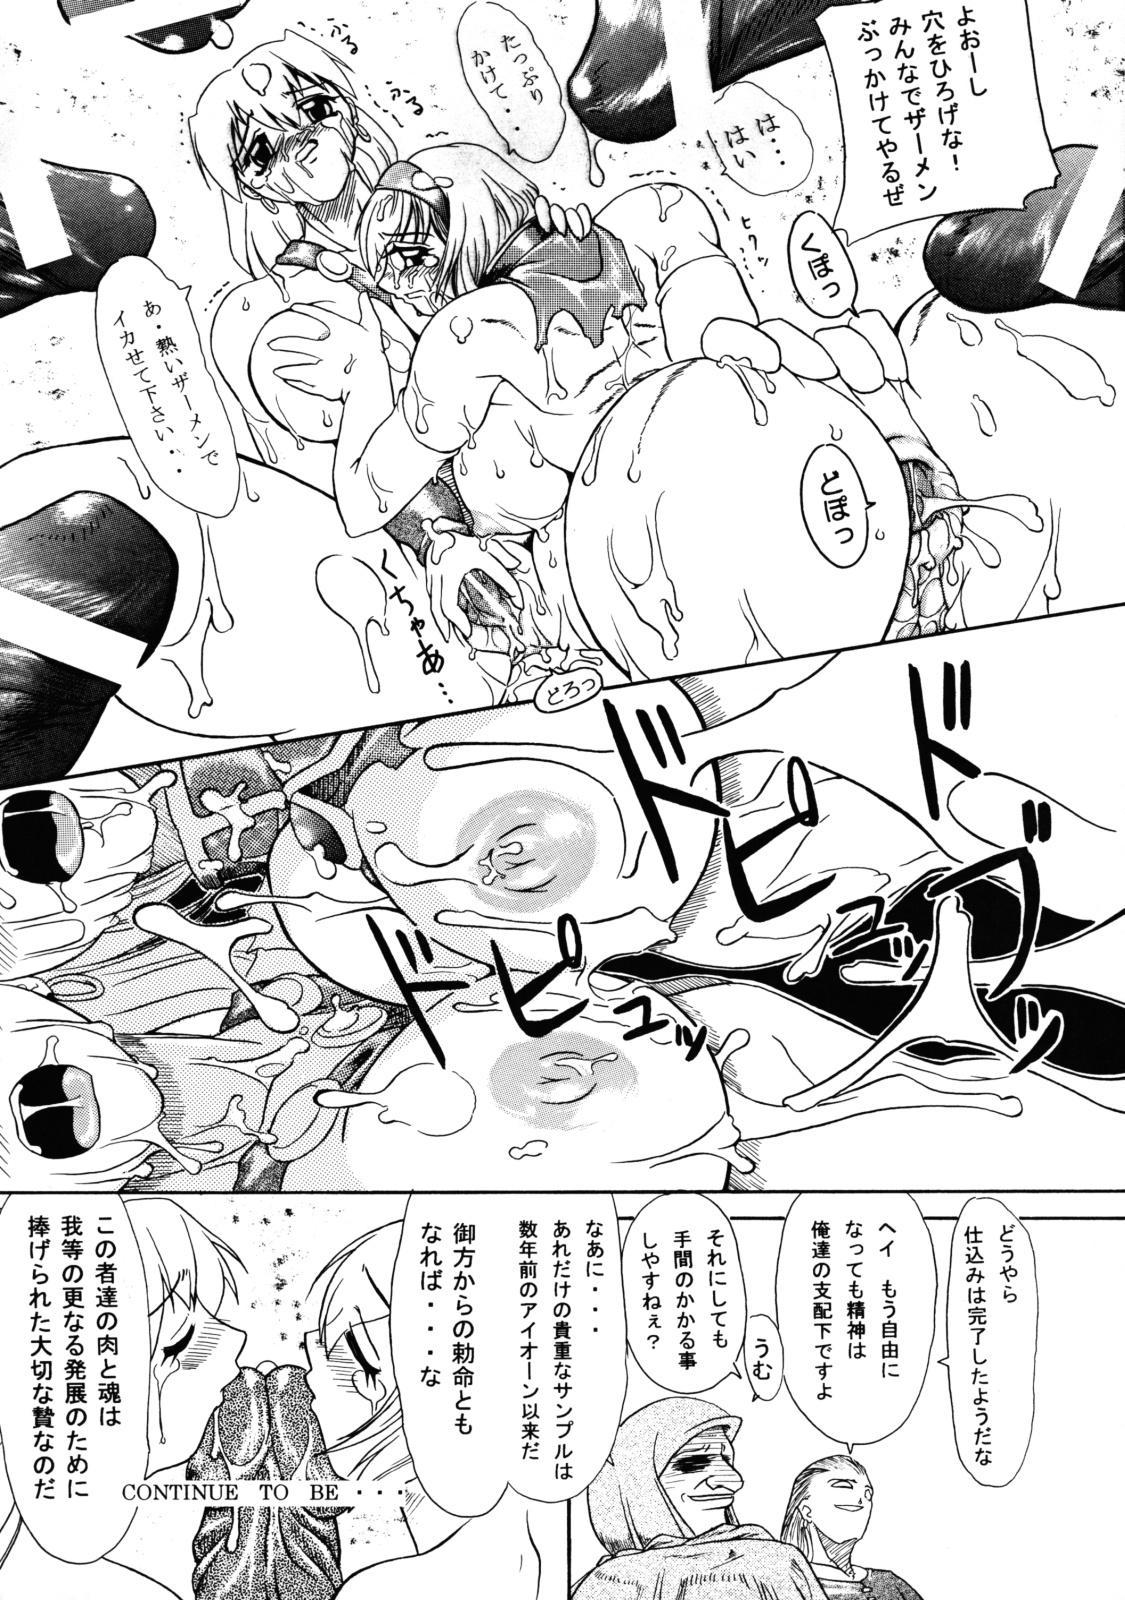 Kakugee Sanmai 3 27